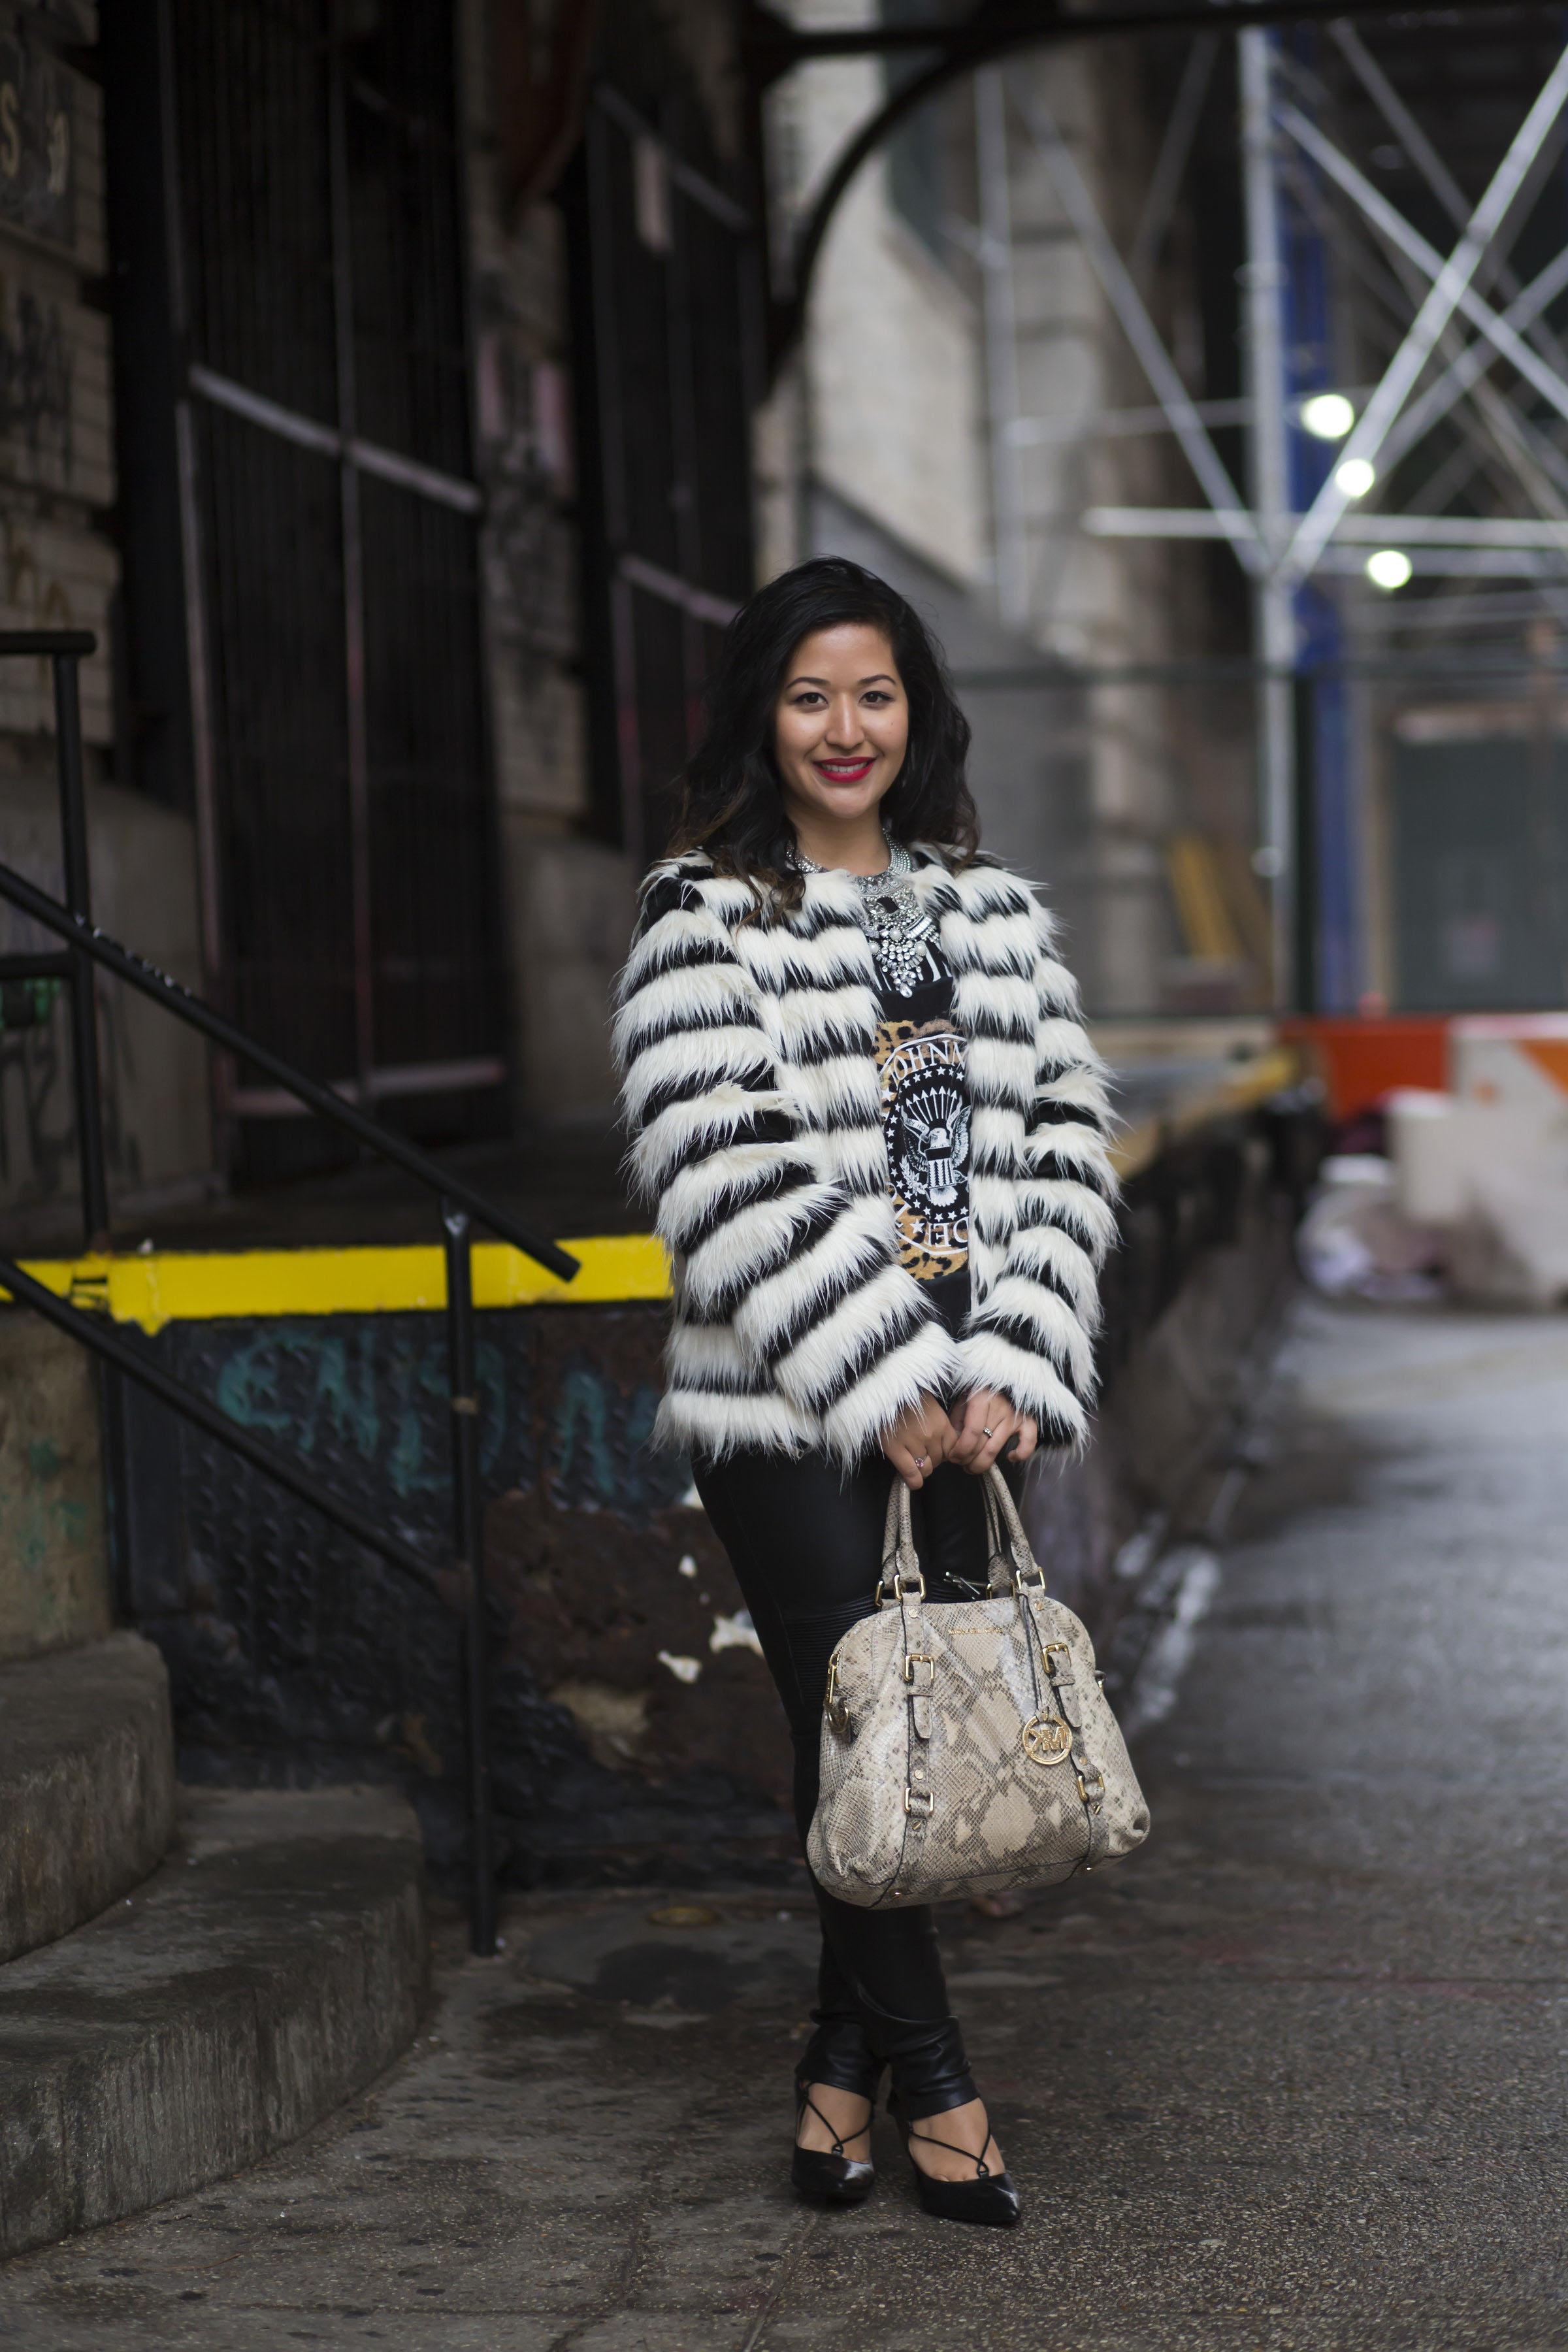 Black and WHite Make Me Chic Jacket x Krity S3.jpg